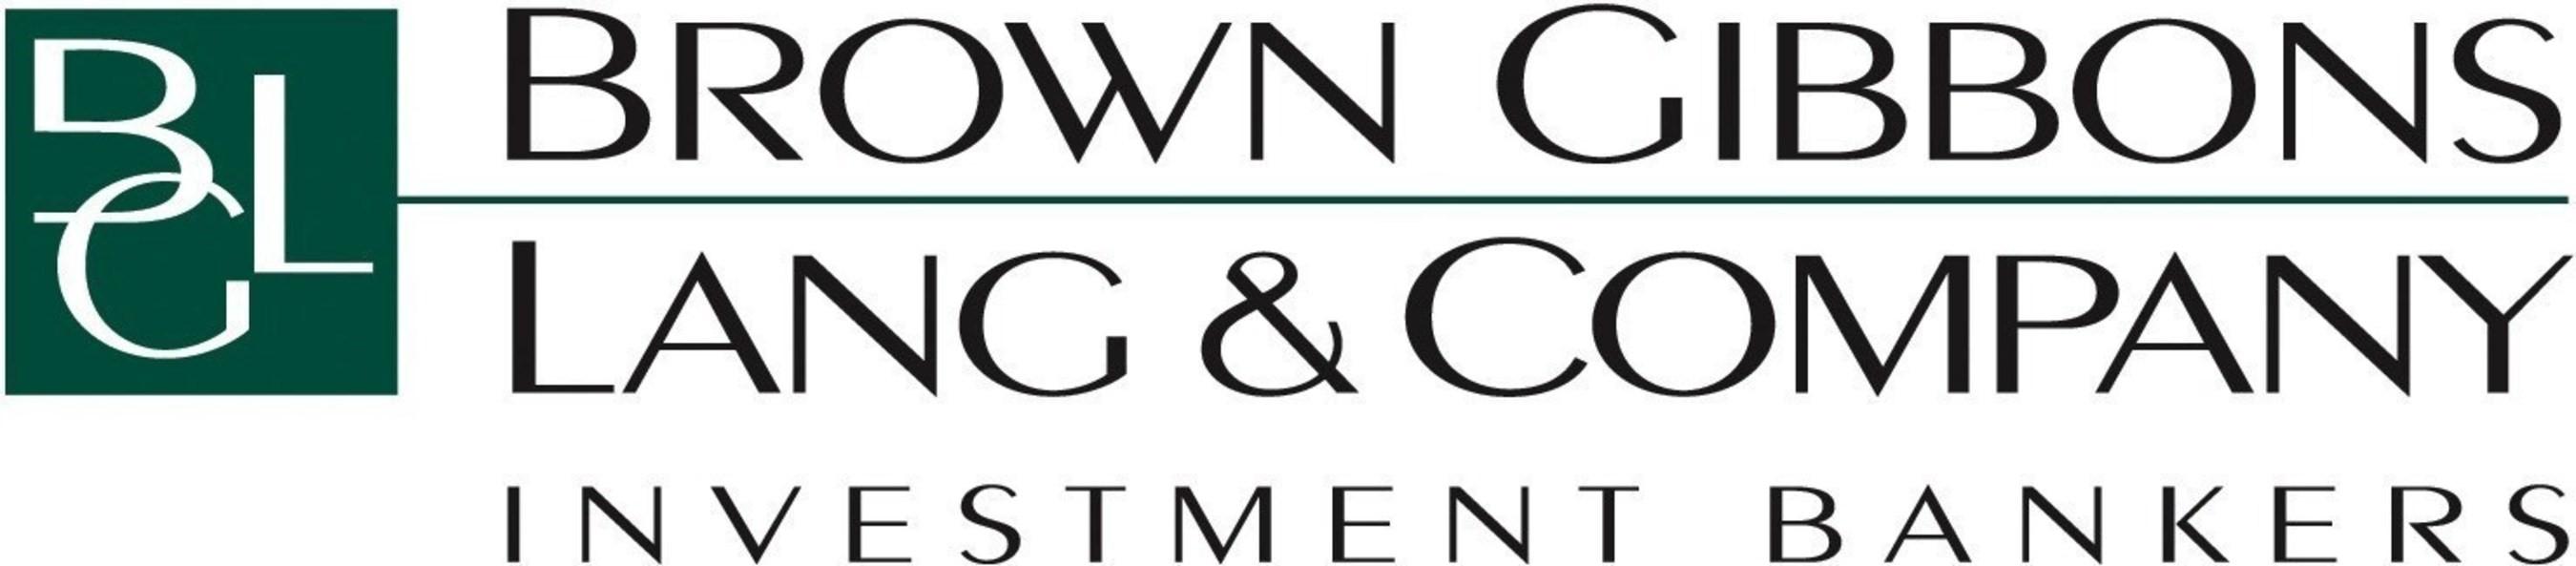 Brown Gibbons Lang and Company